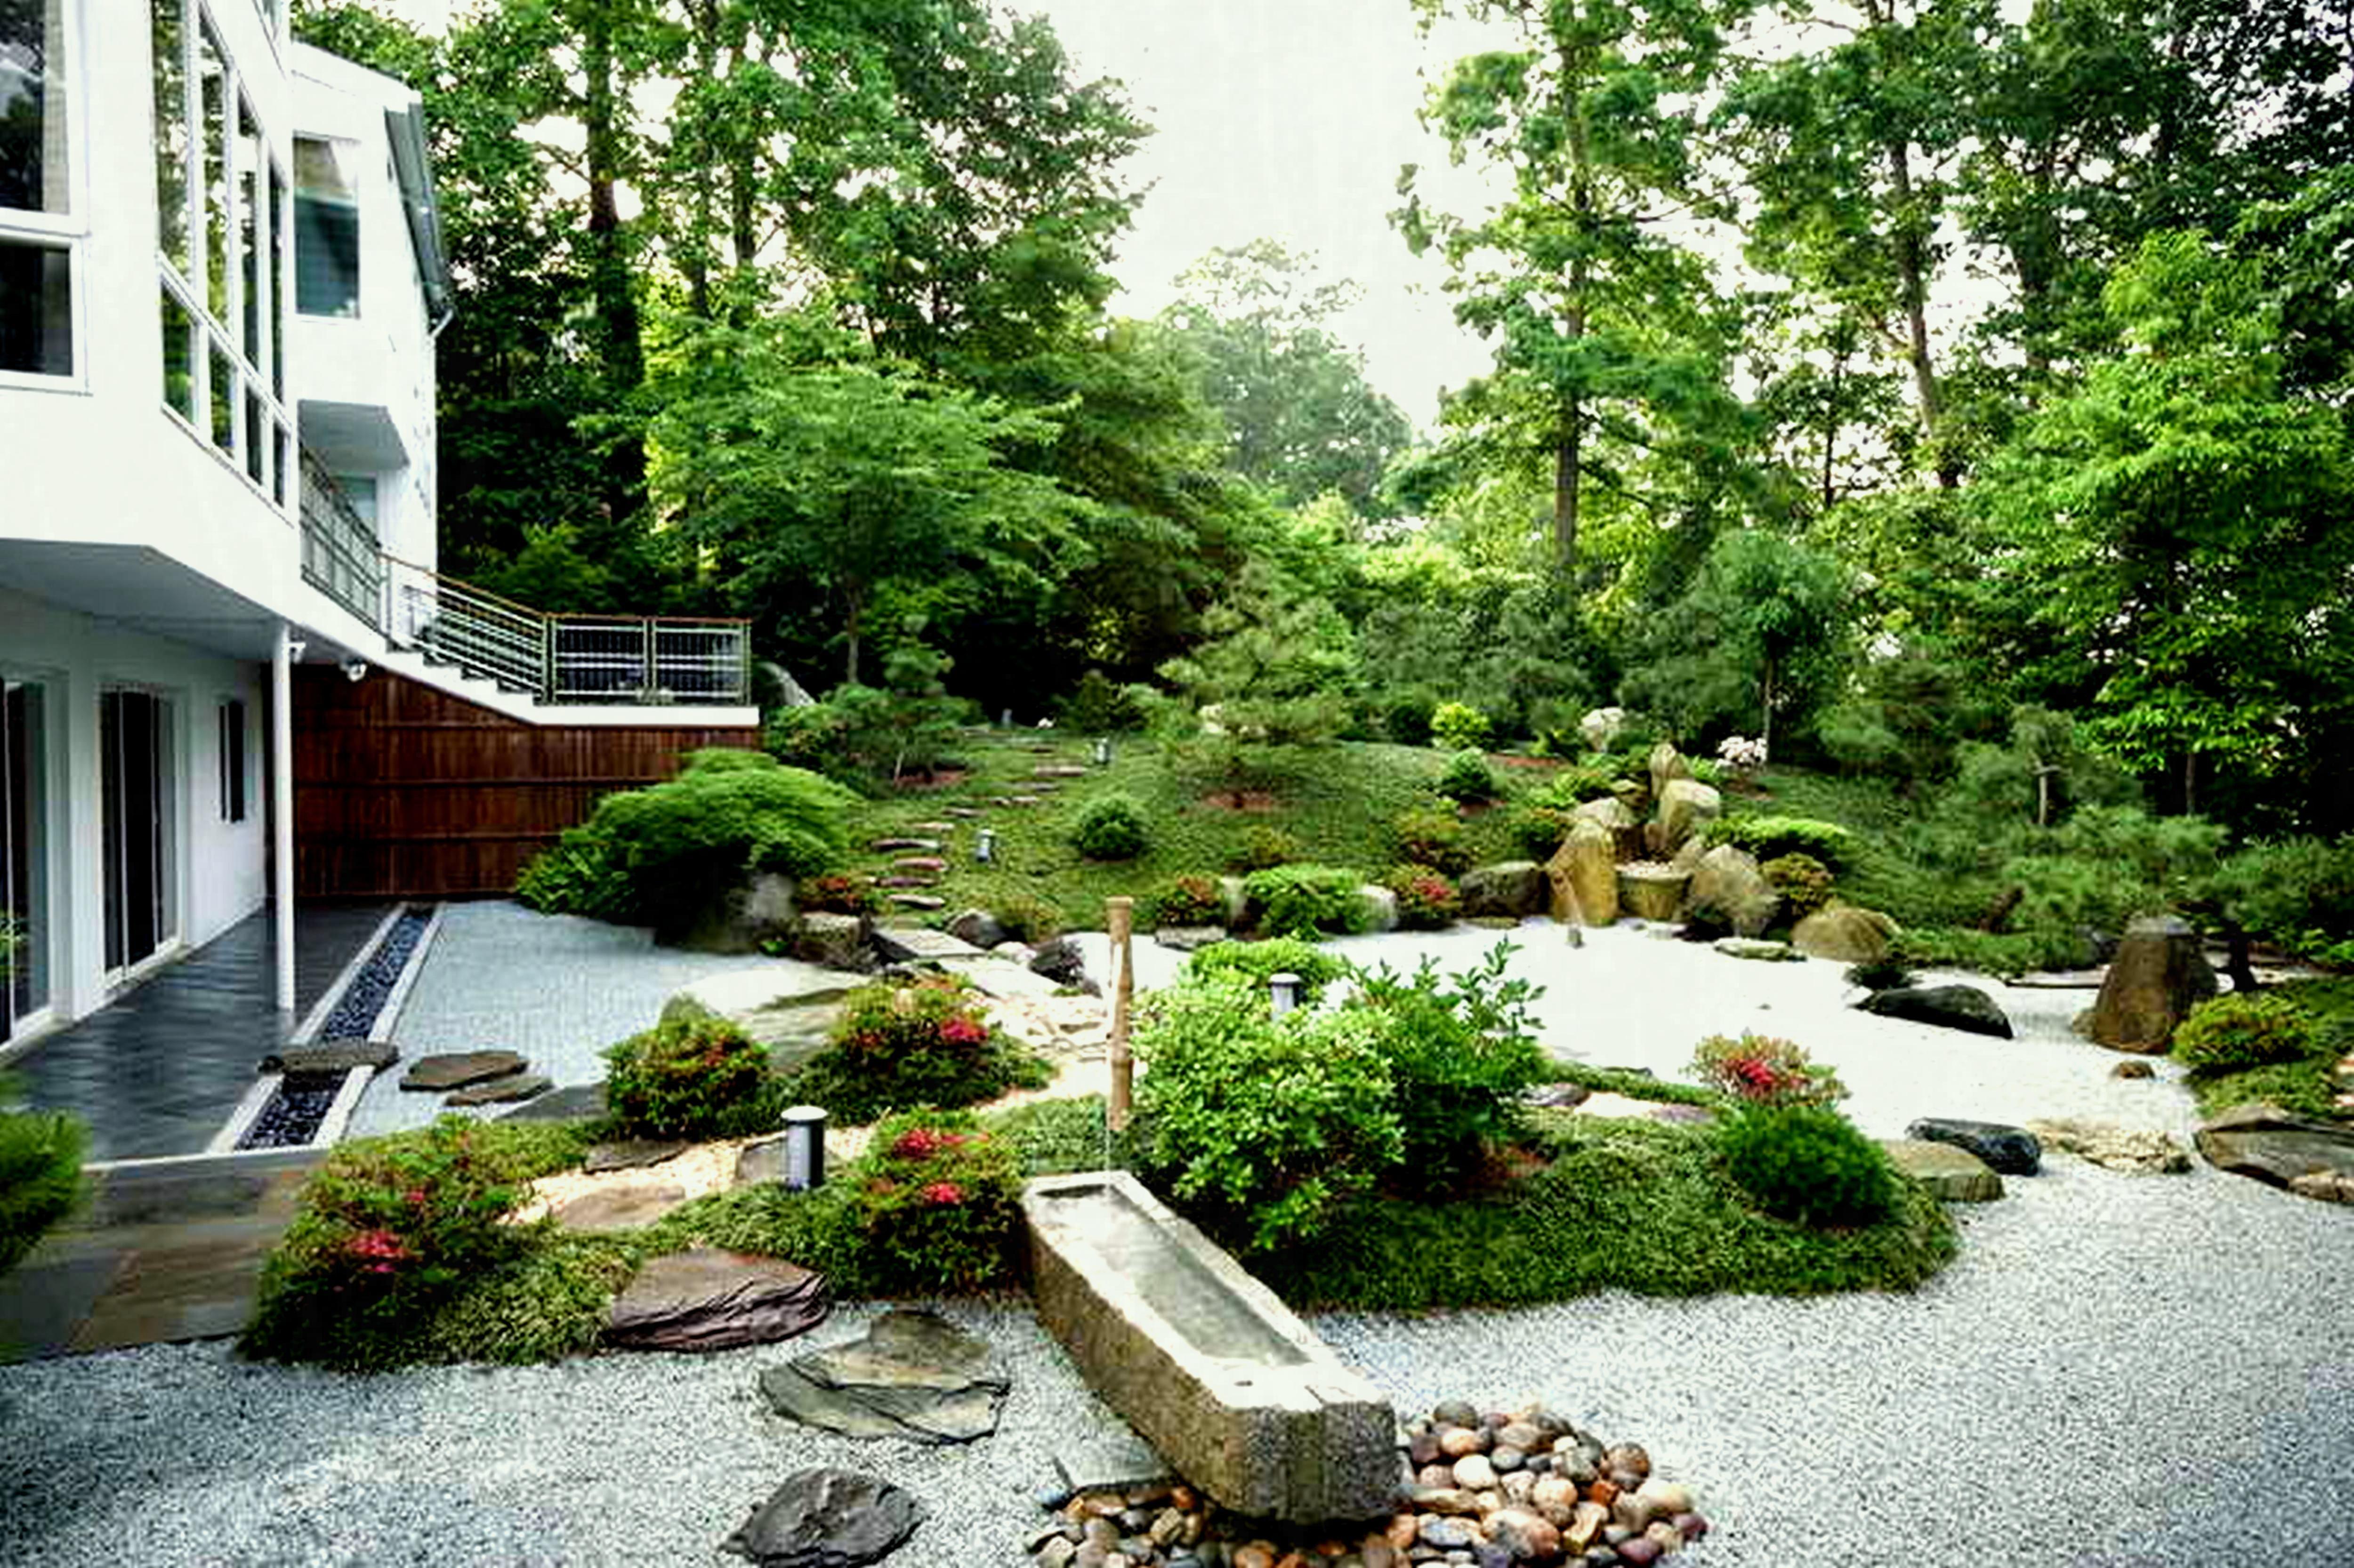 21 Beautiful Zen Garden Ideas 2019 Zengarden Miniature Backyard Diy Landscape Japanese Garden Small Japanese Garden Japanese Garden Landscape